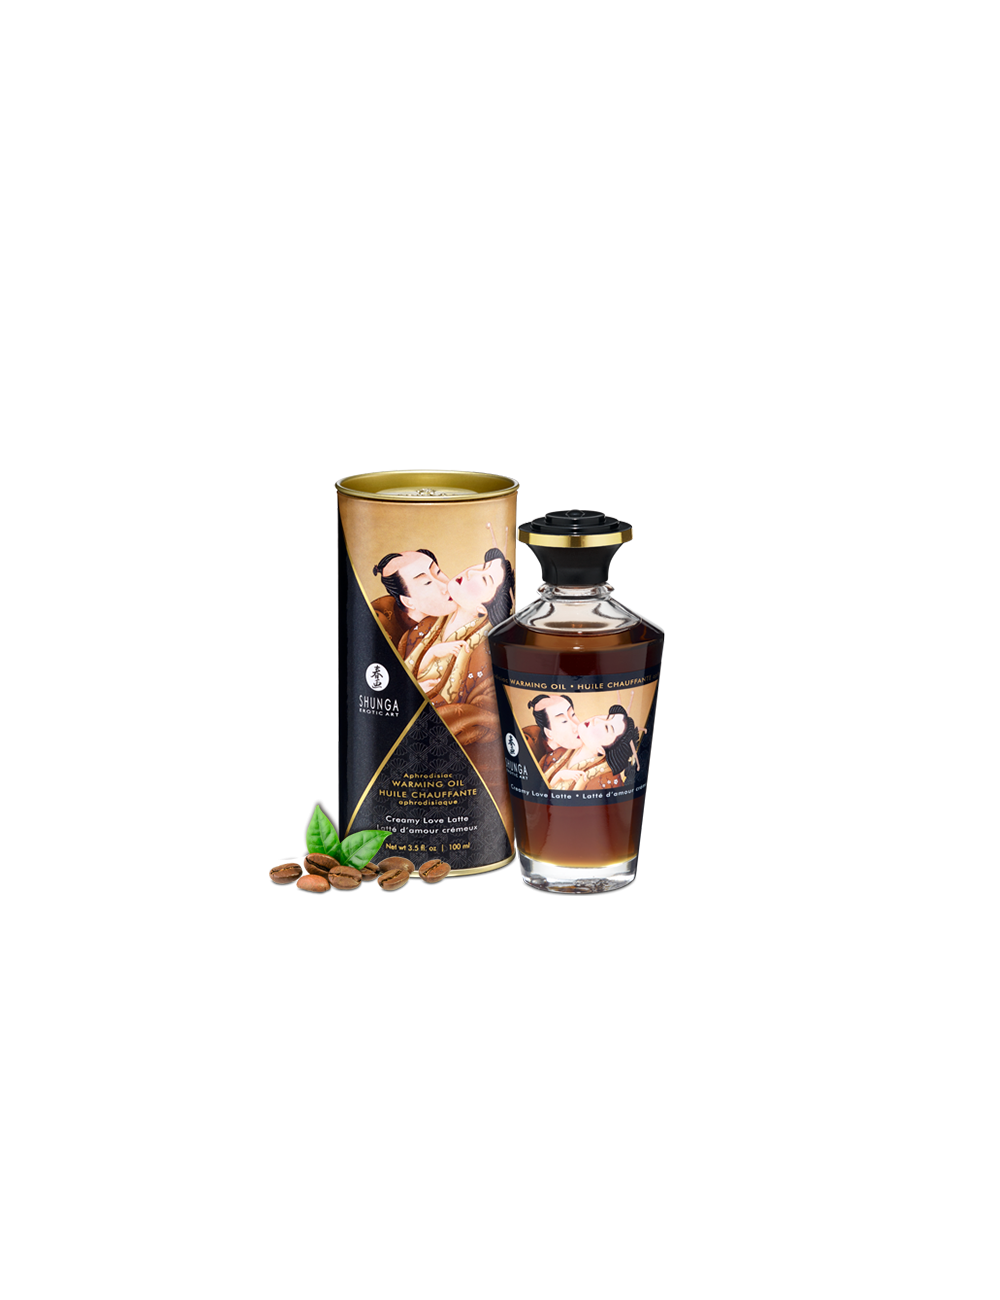 Huile chauffante aphrodisiaque latte d'amour 100ml